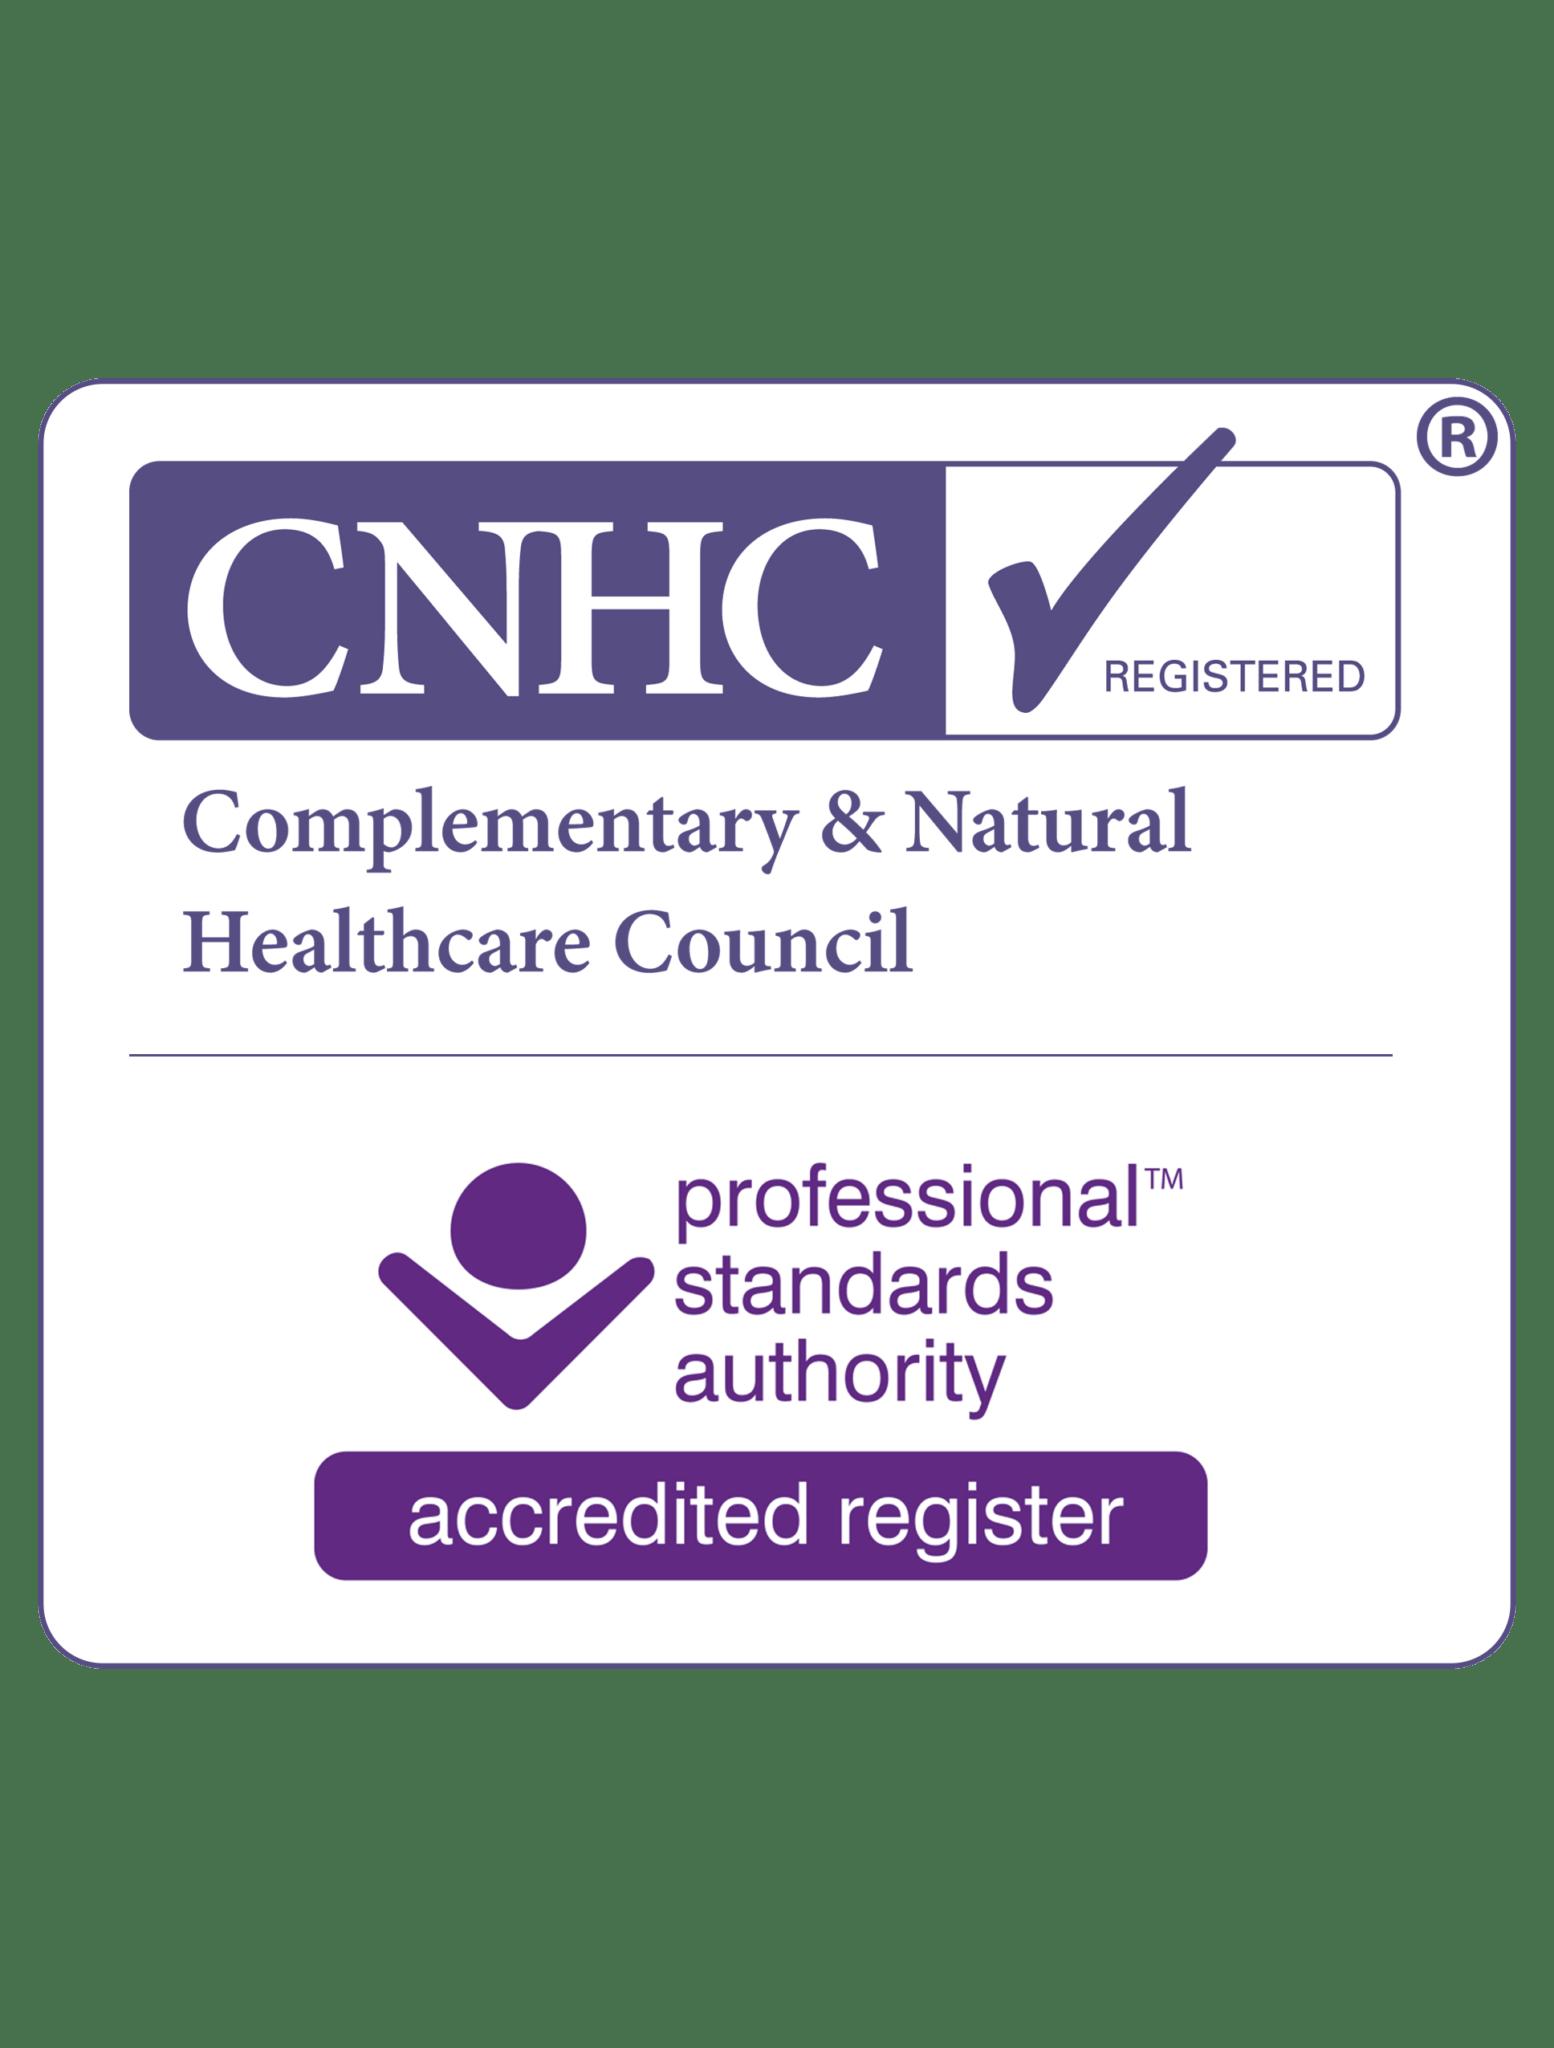 CNHC-1.png